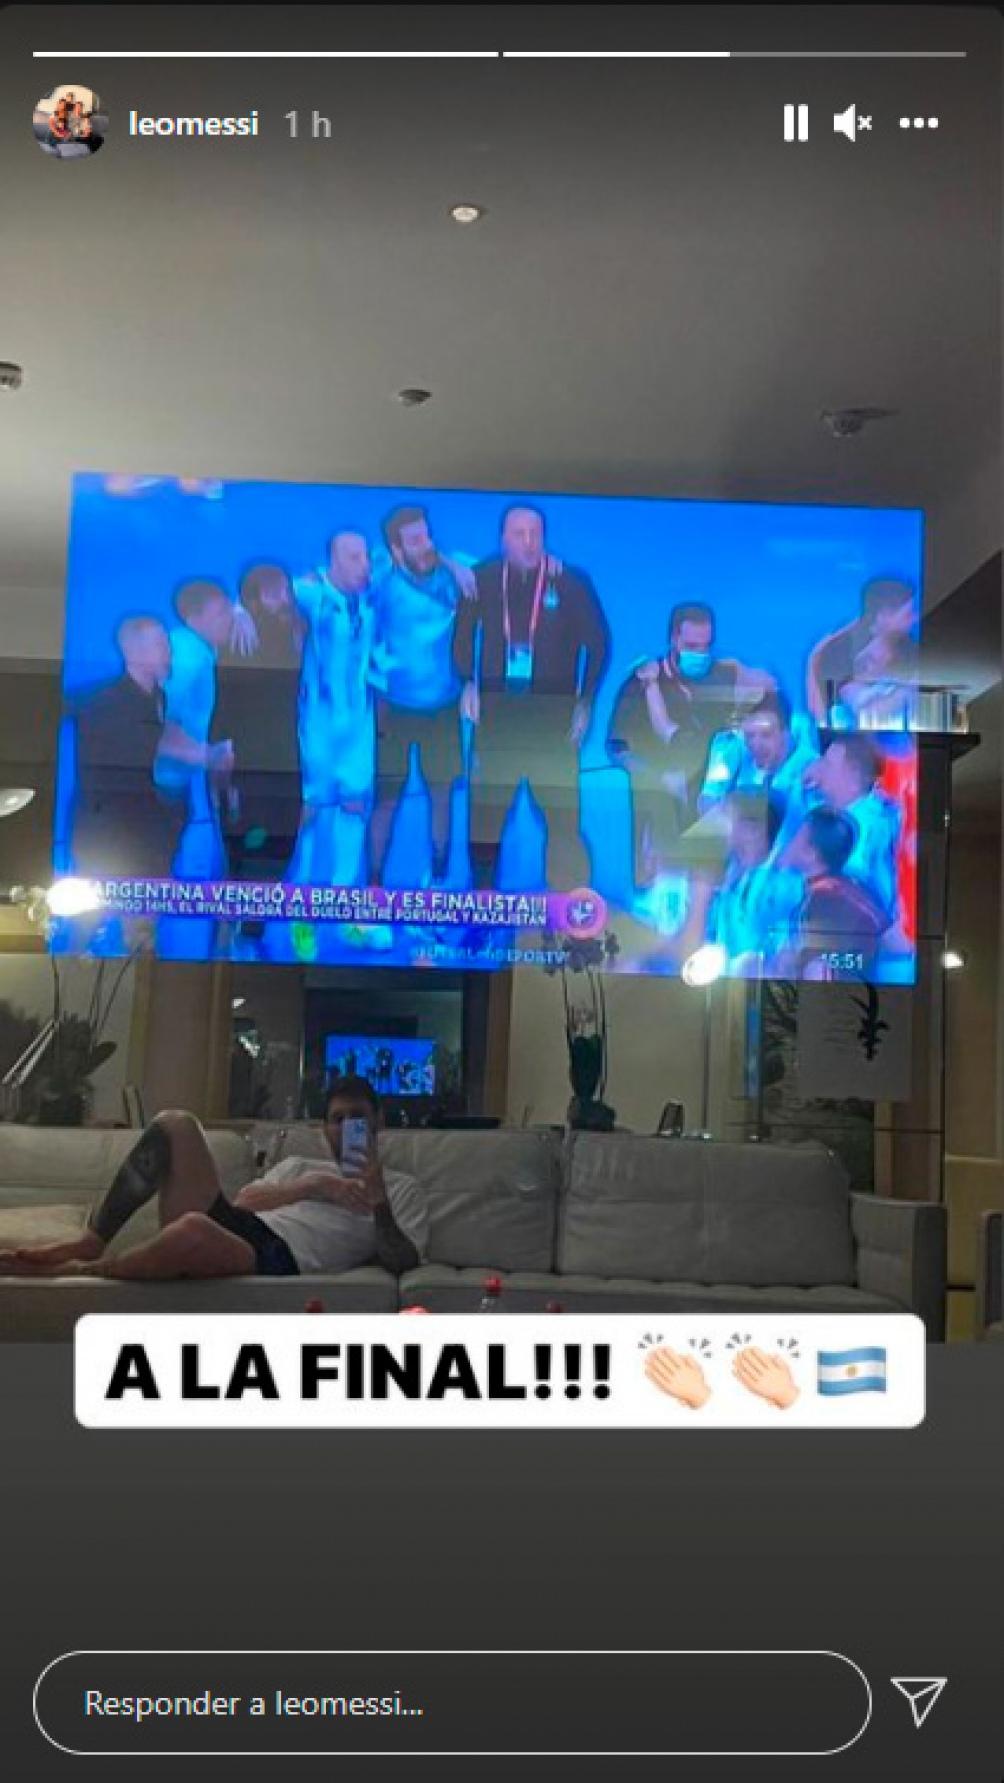 Messi en su hogar festejó el pase a la final de Argentina en la Copa del Mundo de Futsal. Foto: @Leomessi